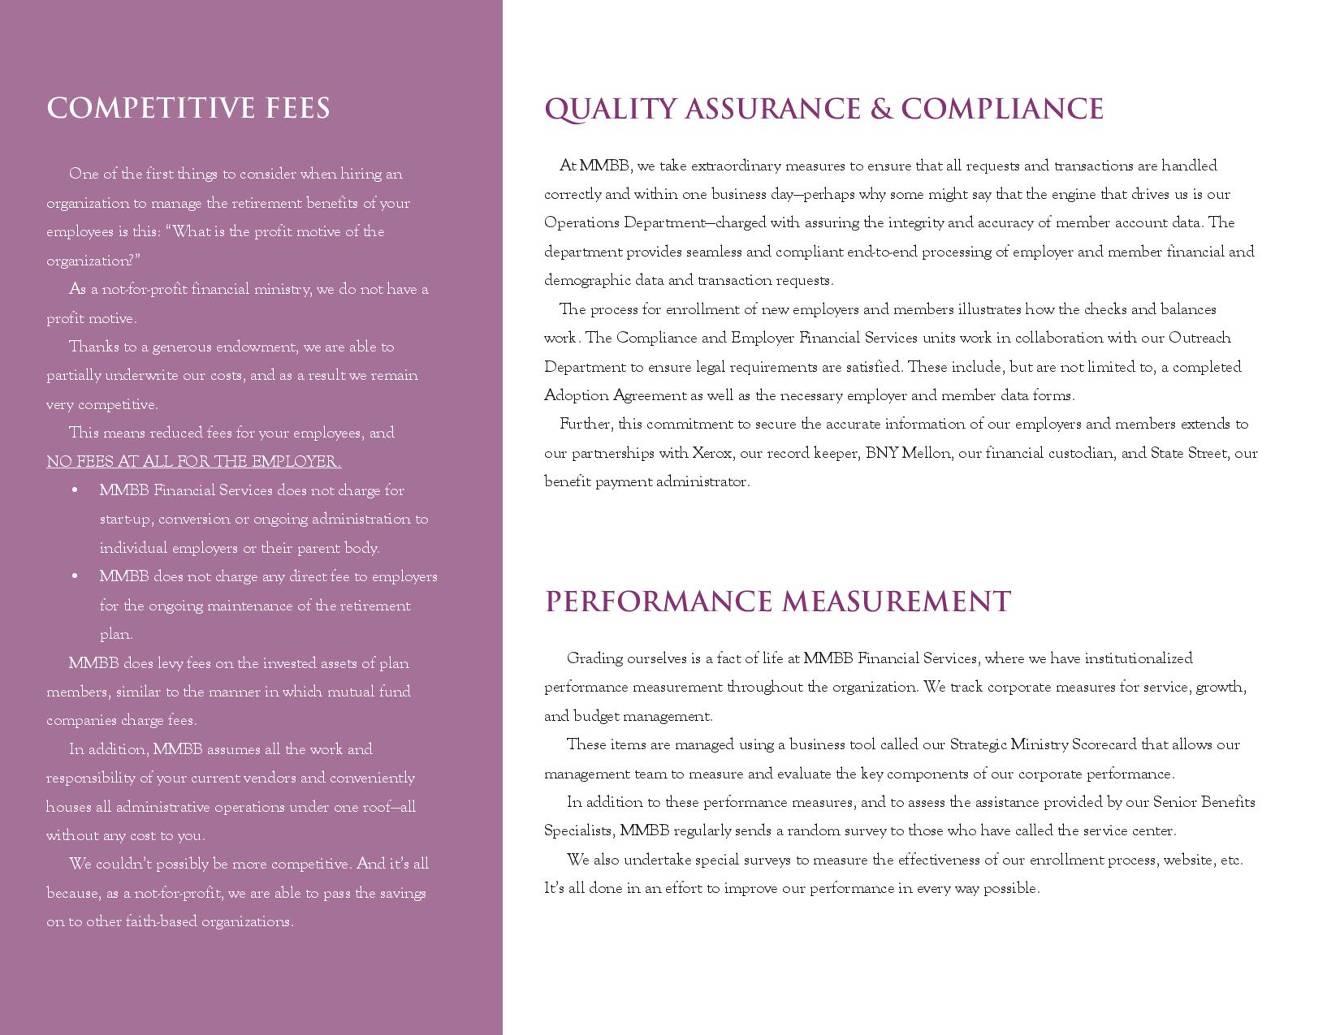 MMBB-Executive-Brochure-page-12_2x.jpg